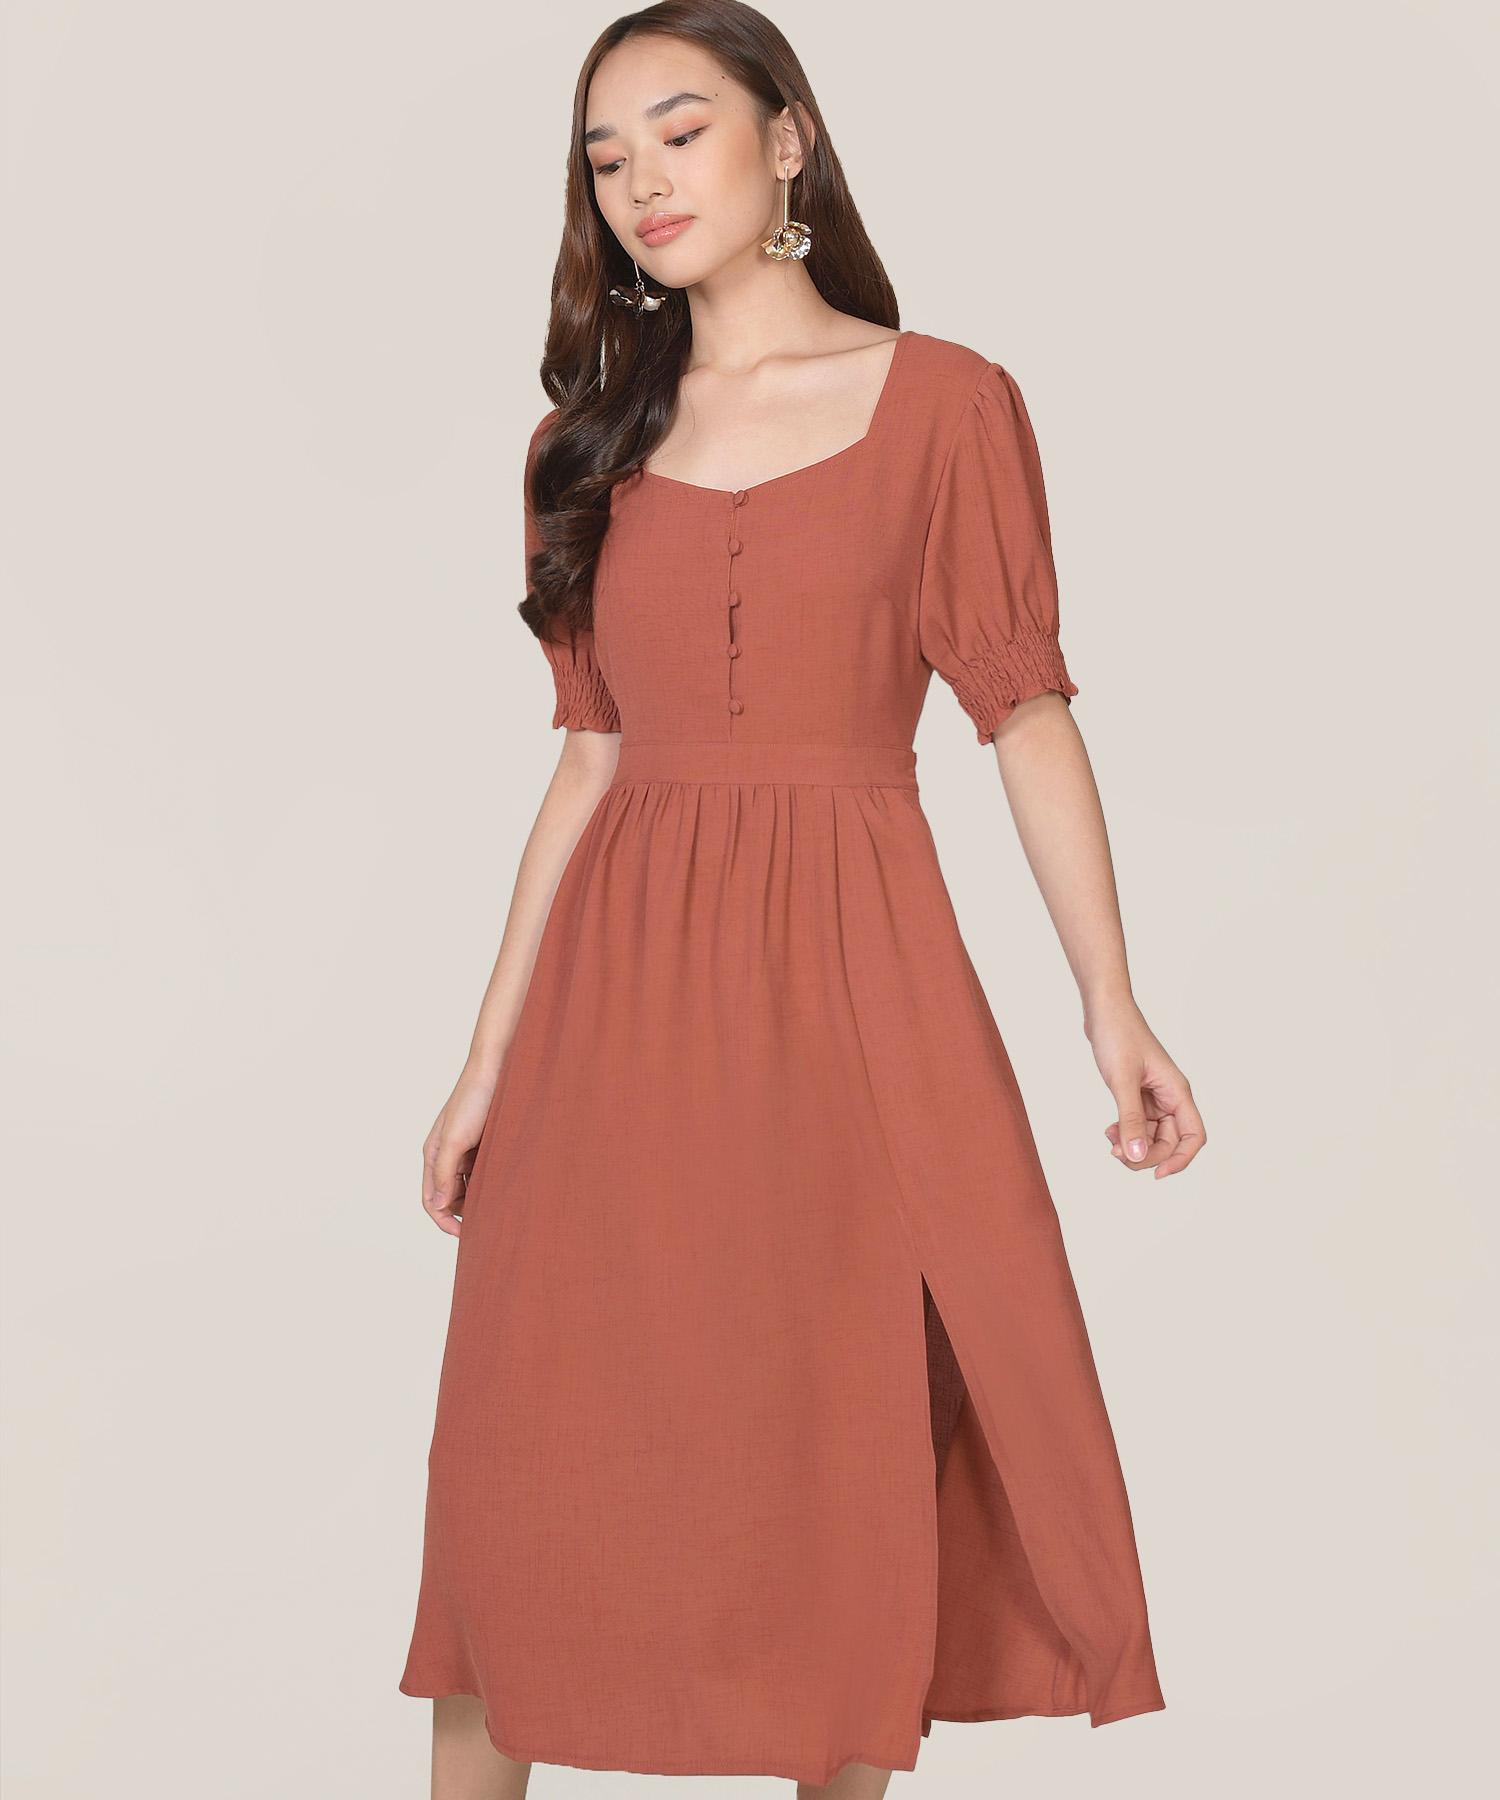 lafayette-midi-dress-redwood-1